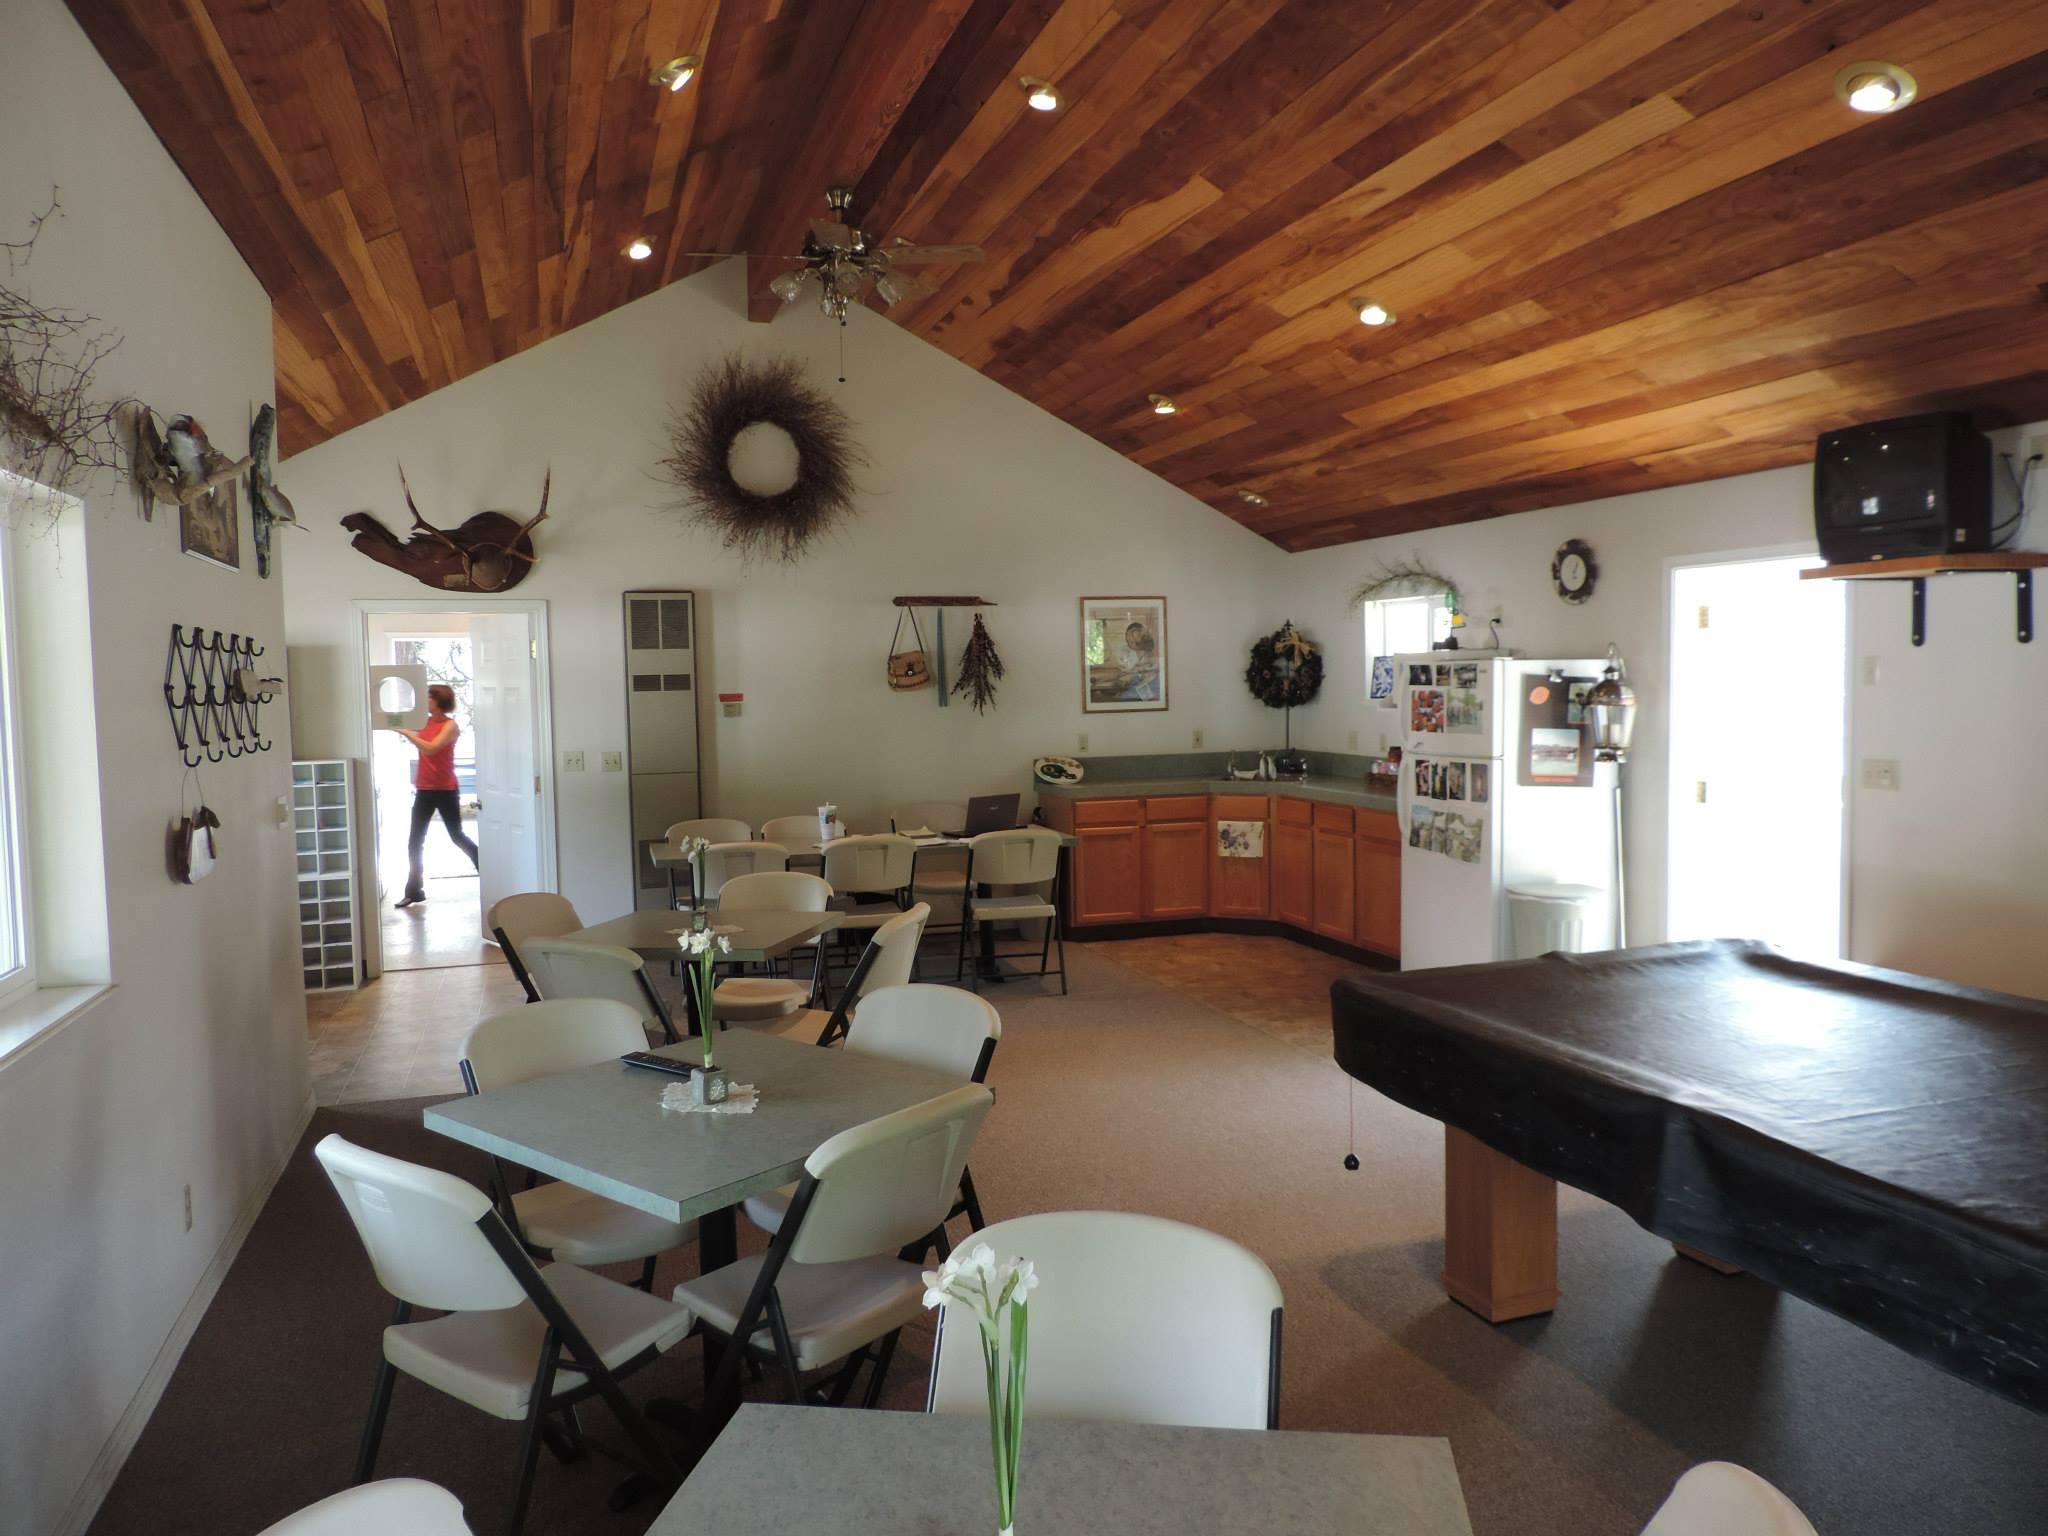 Rising River RV Park in Roseburg, Oregon - Best RV Campground, Full